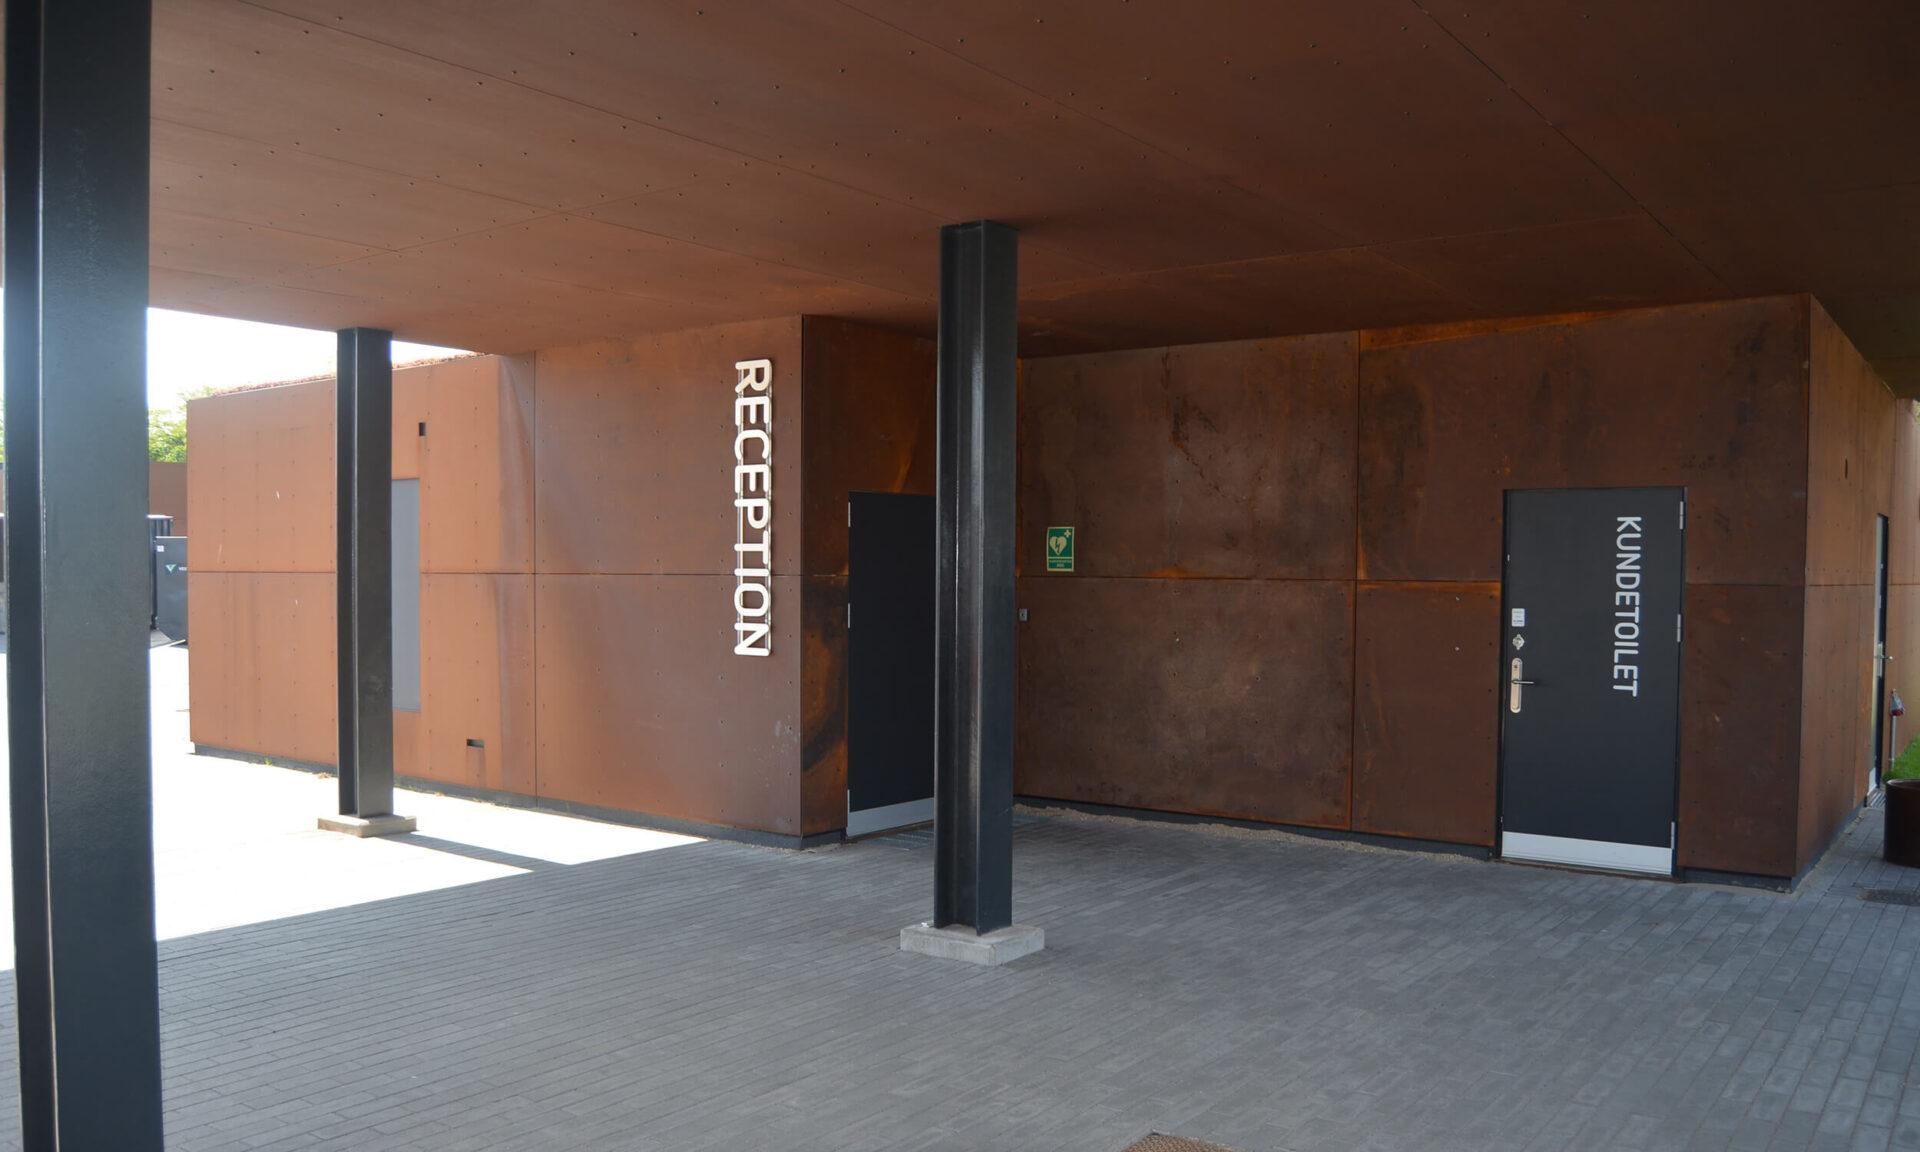 Gentofte Genbrugs Station